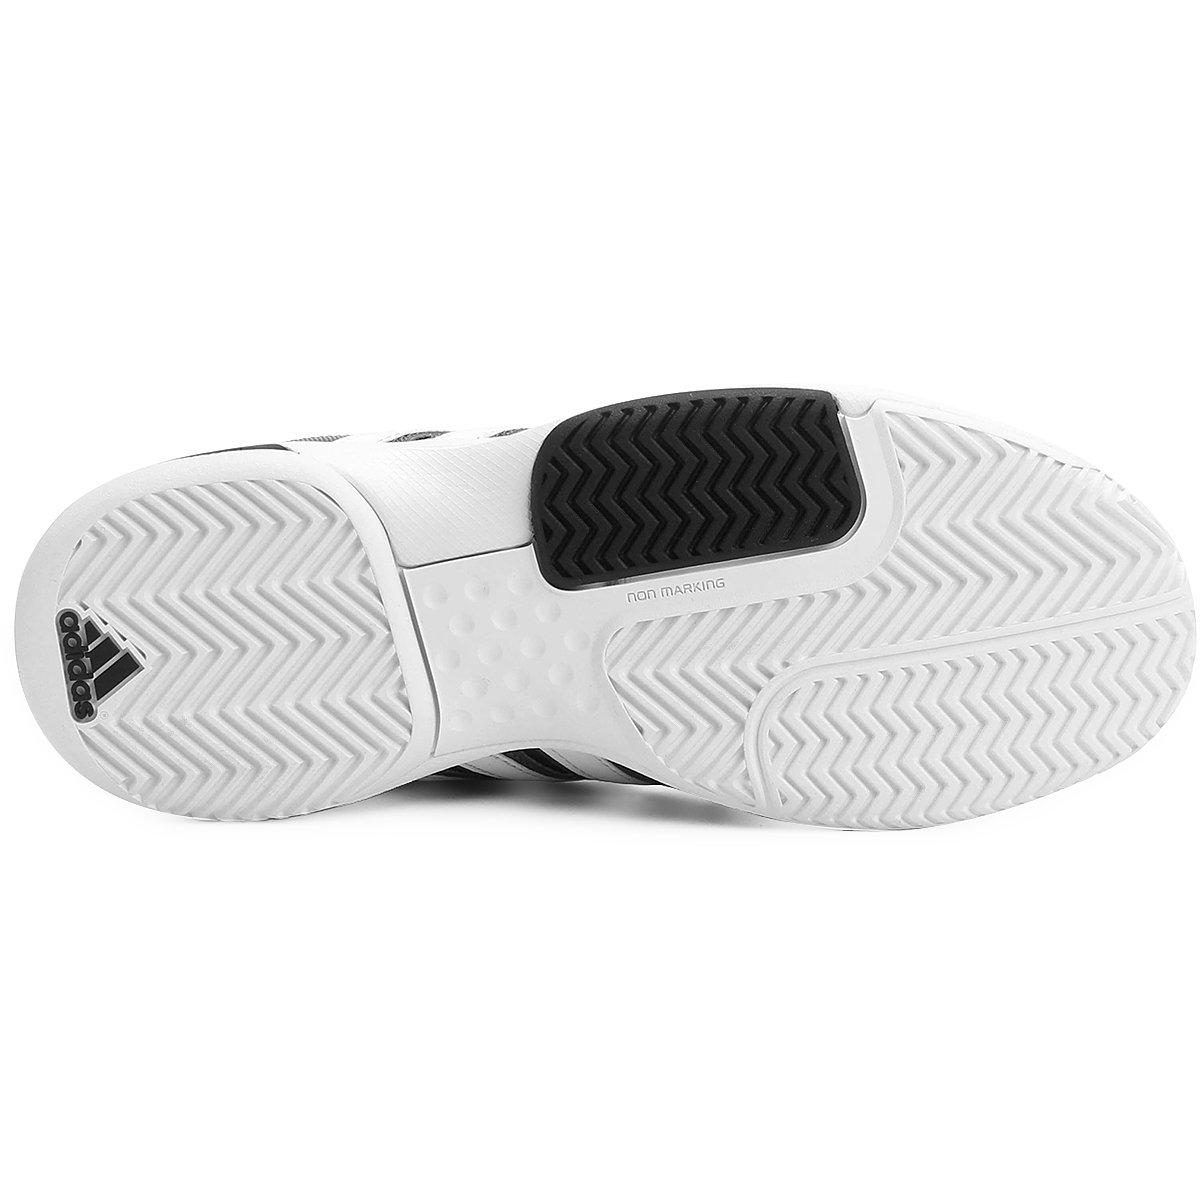 Tênis Adidas Barricade Approach Str Masculino - Compre Agora  313fba7fada1d